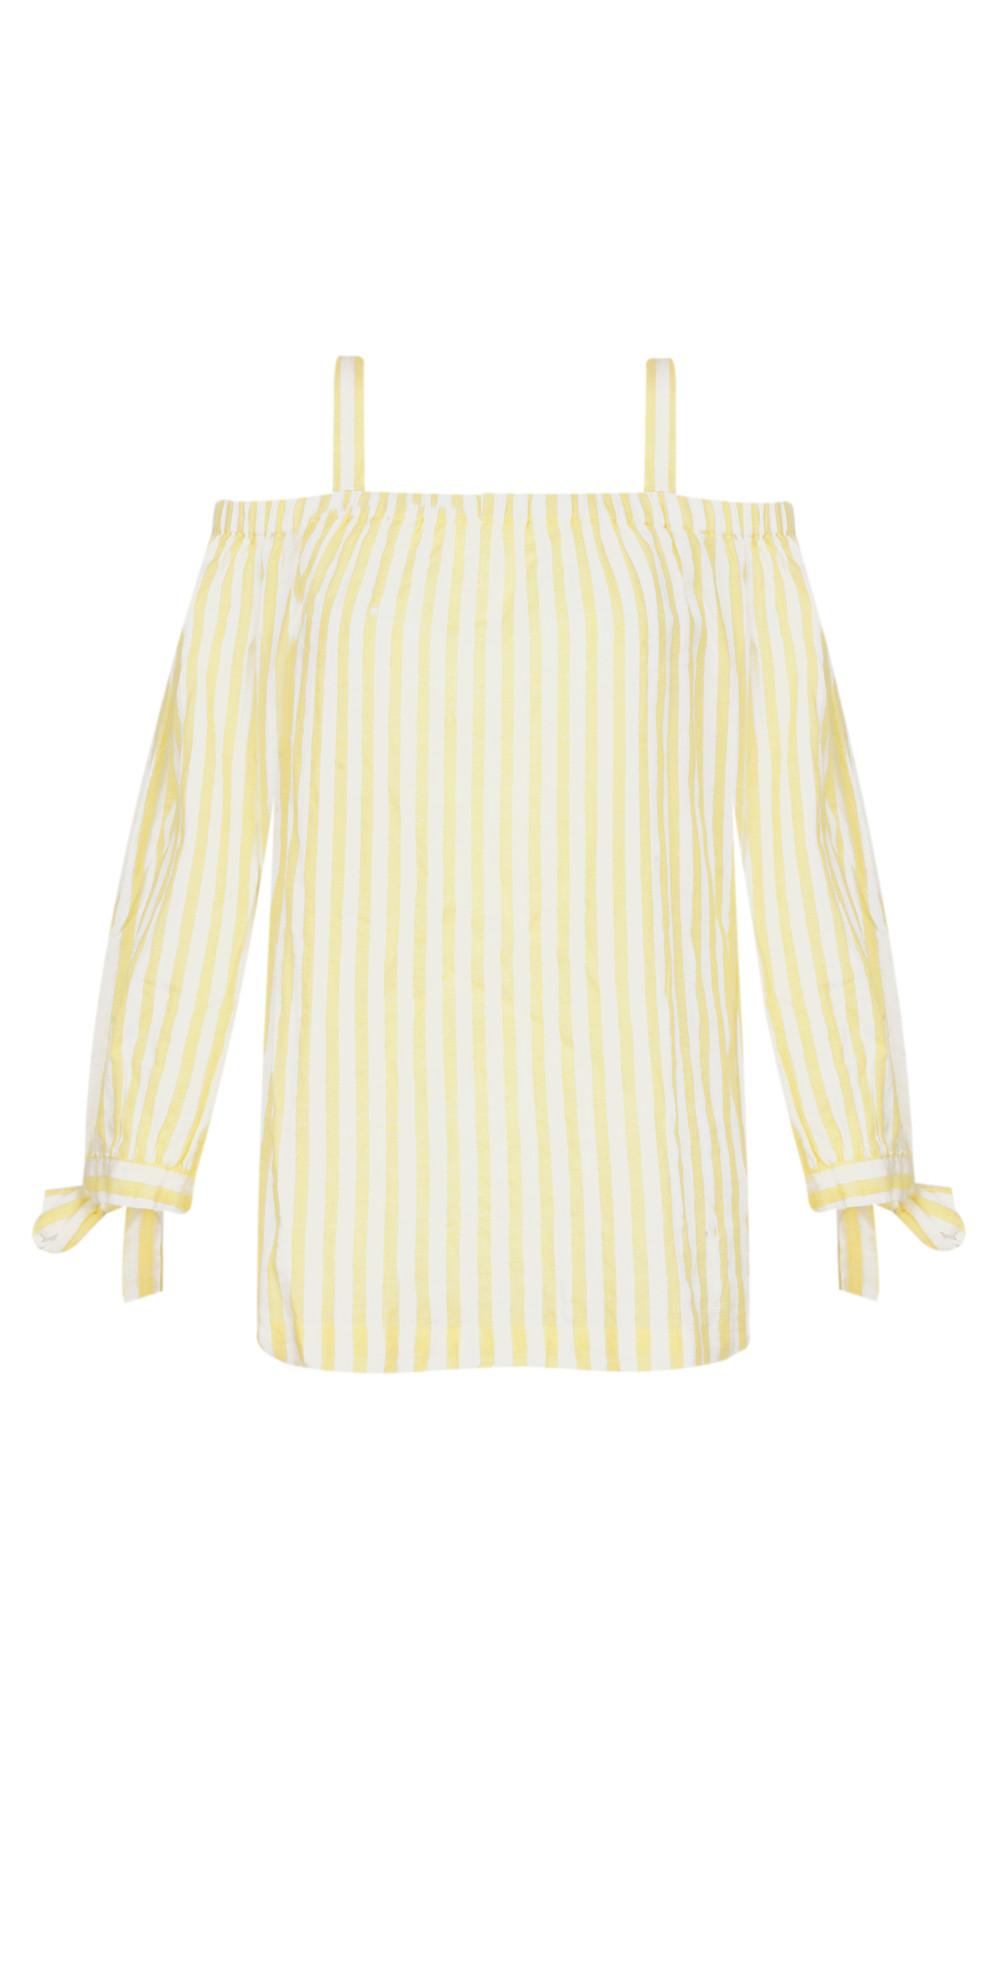 Cold Shoulder Striped Blouse main image